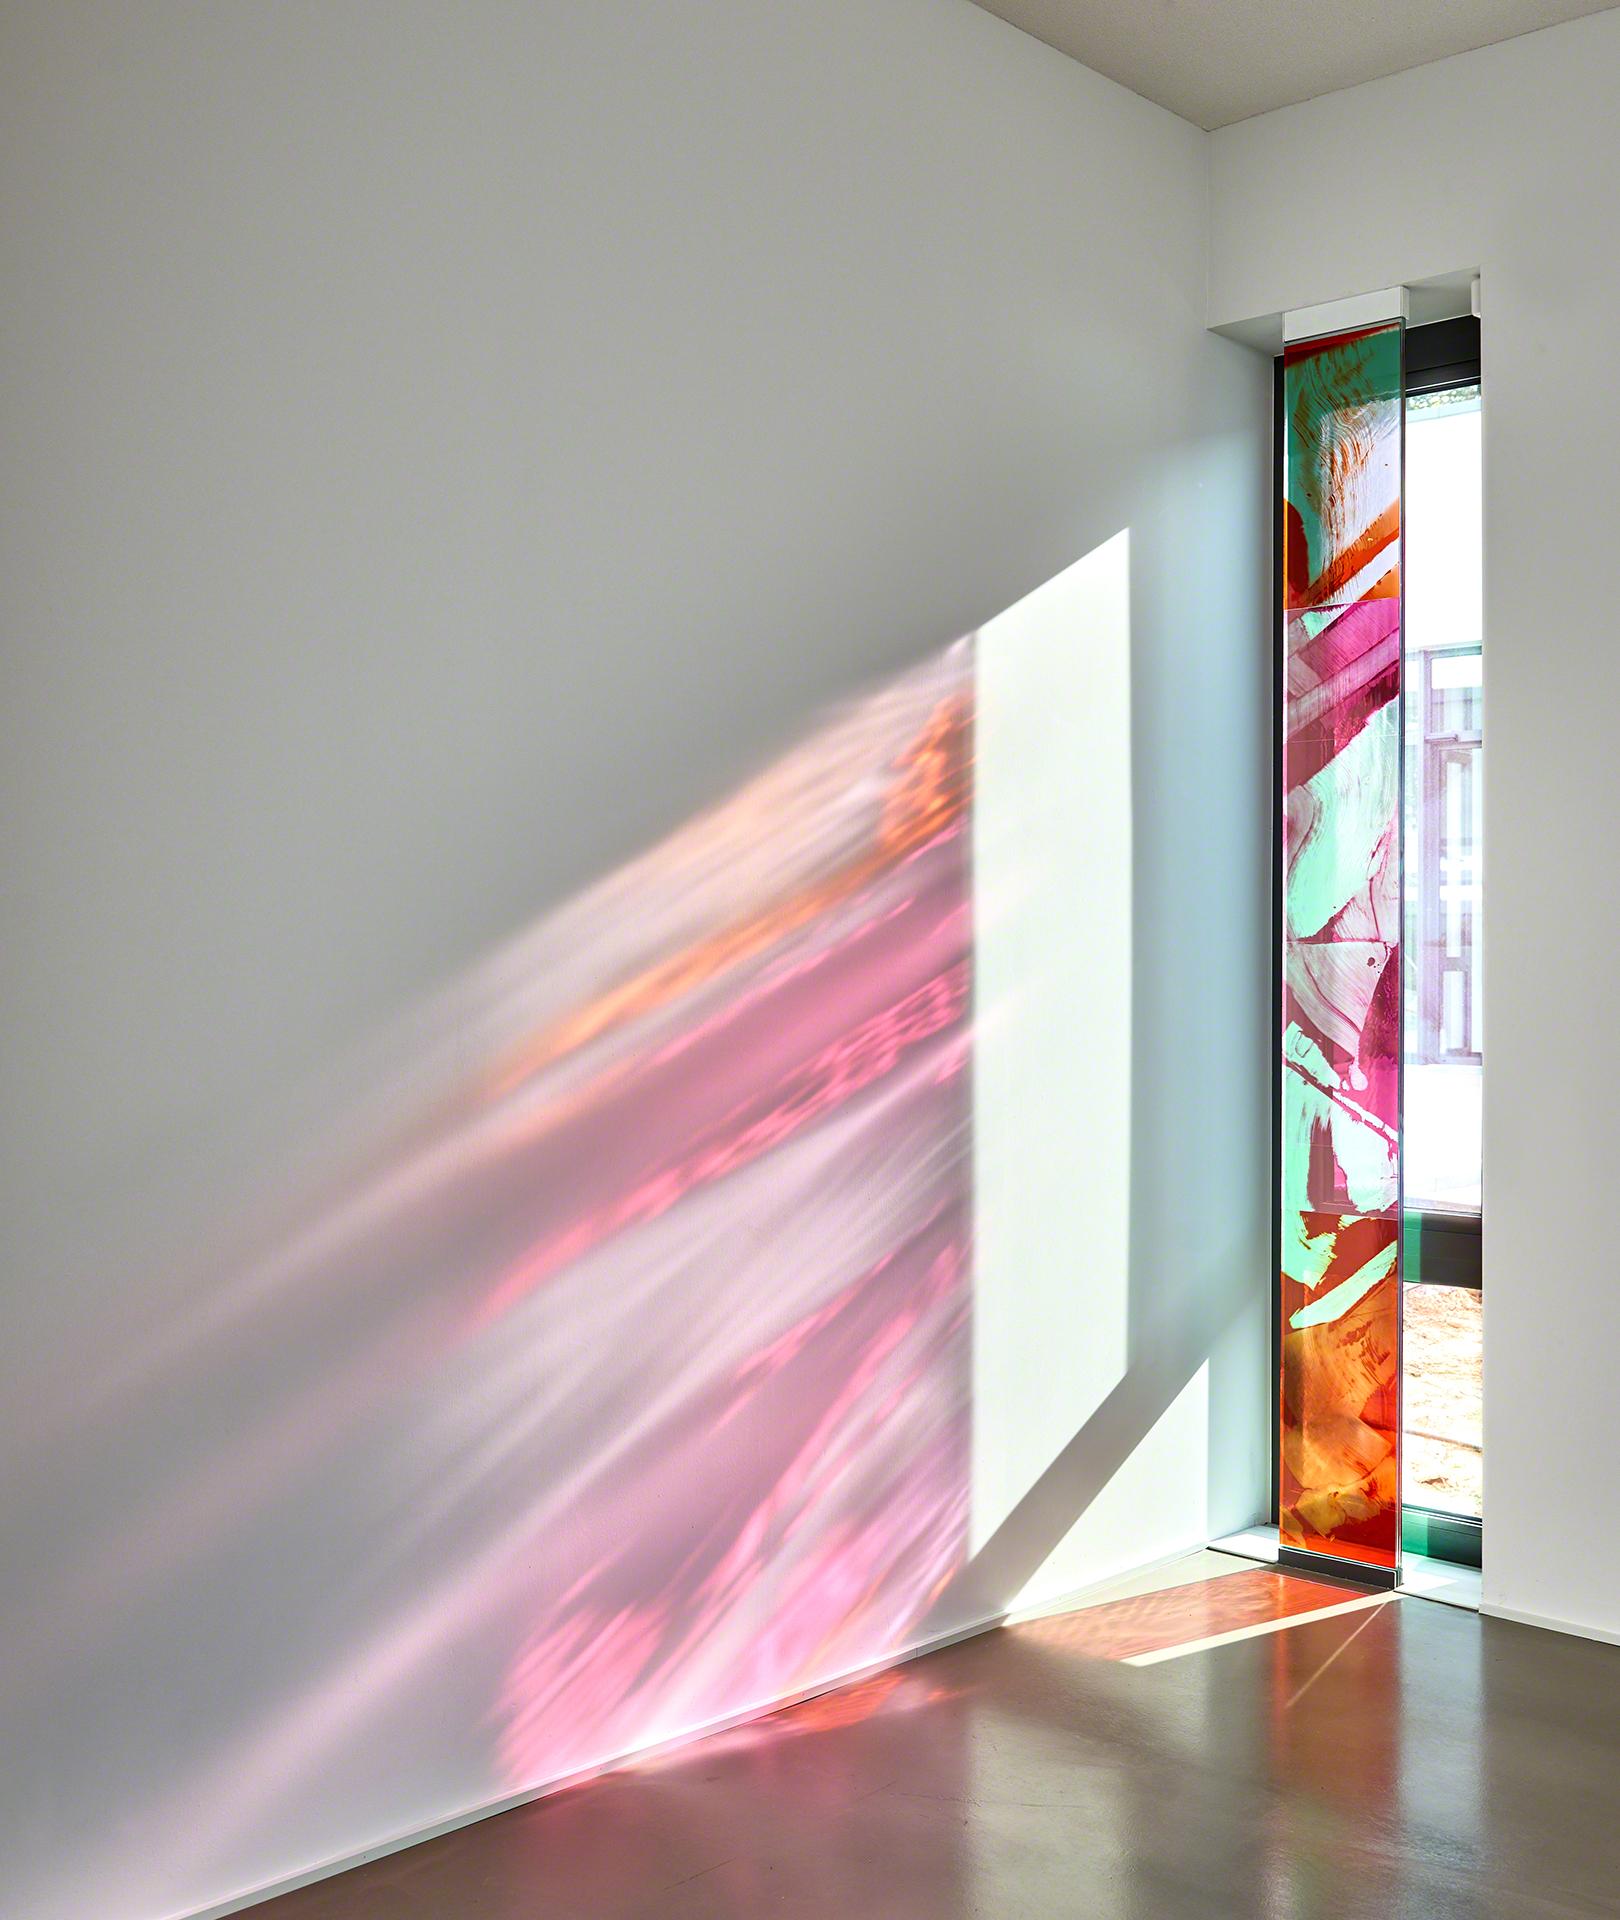 Lichtinstallation, Glas, Kunst, IKKG, A+R Fotografie, Glaskunst, Modern, Kapelle, Fotografie, Helge Articus, Articus & Röttgen Fotografie